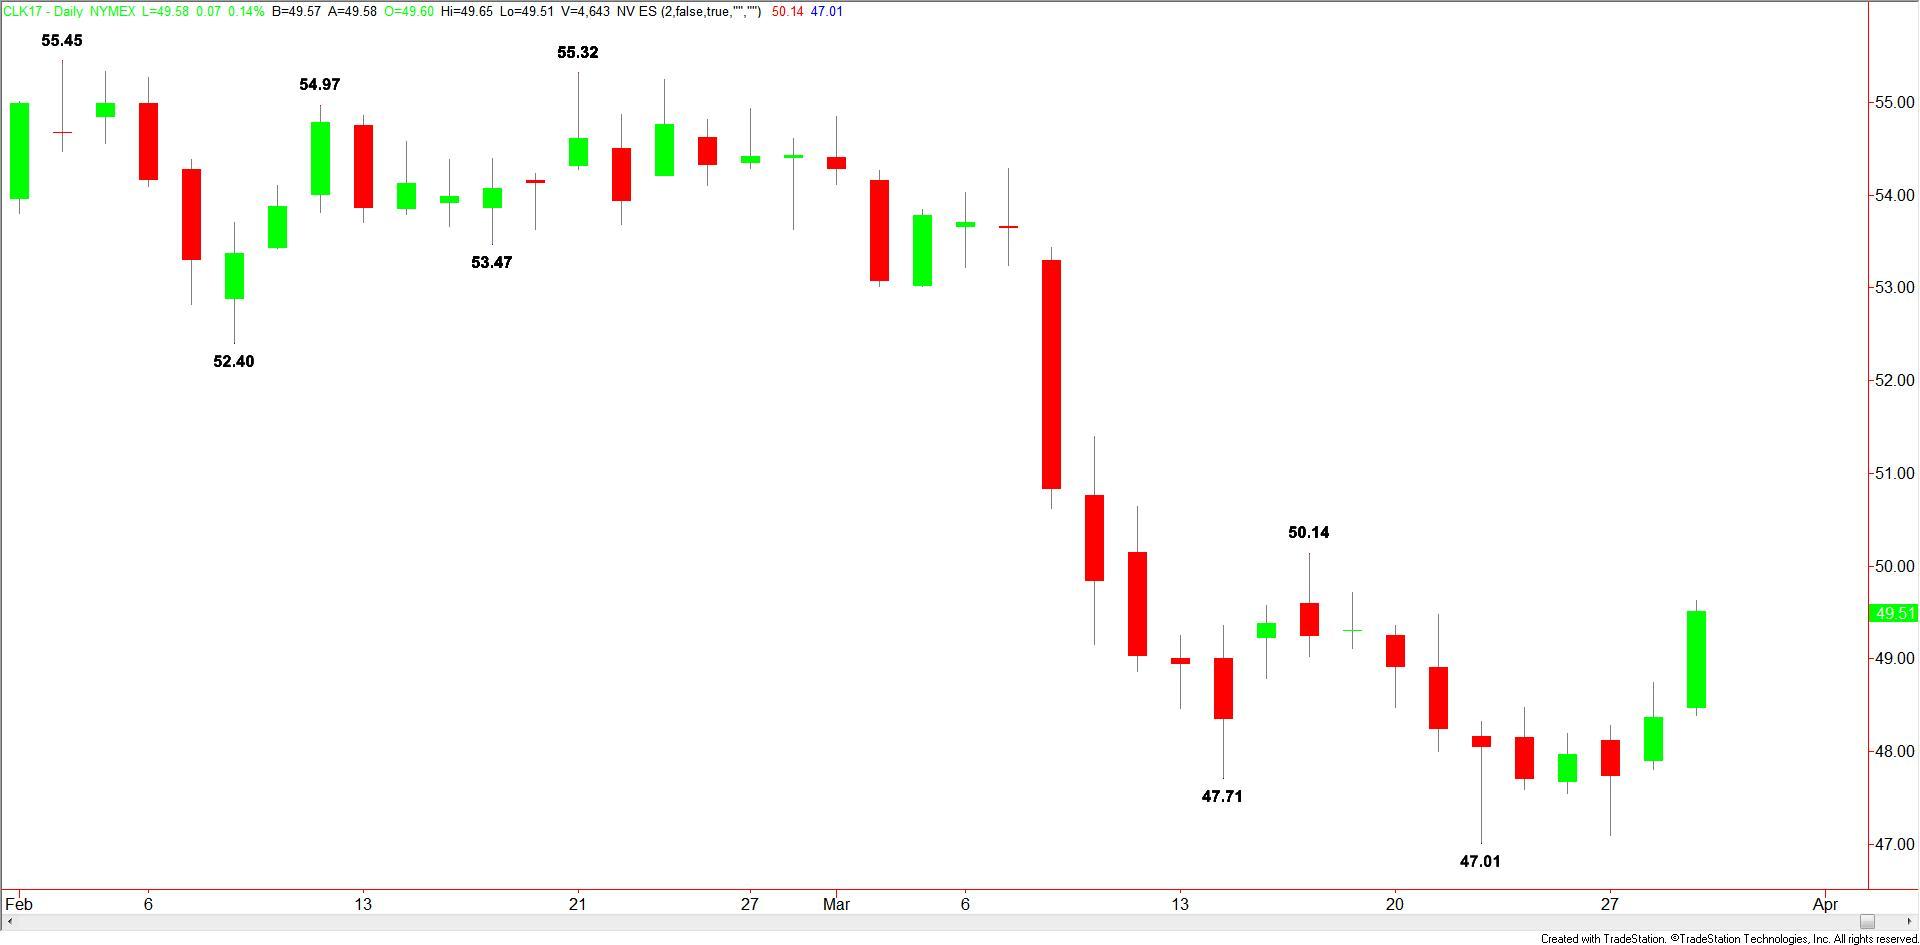 Daily WTI Crude Oil